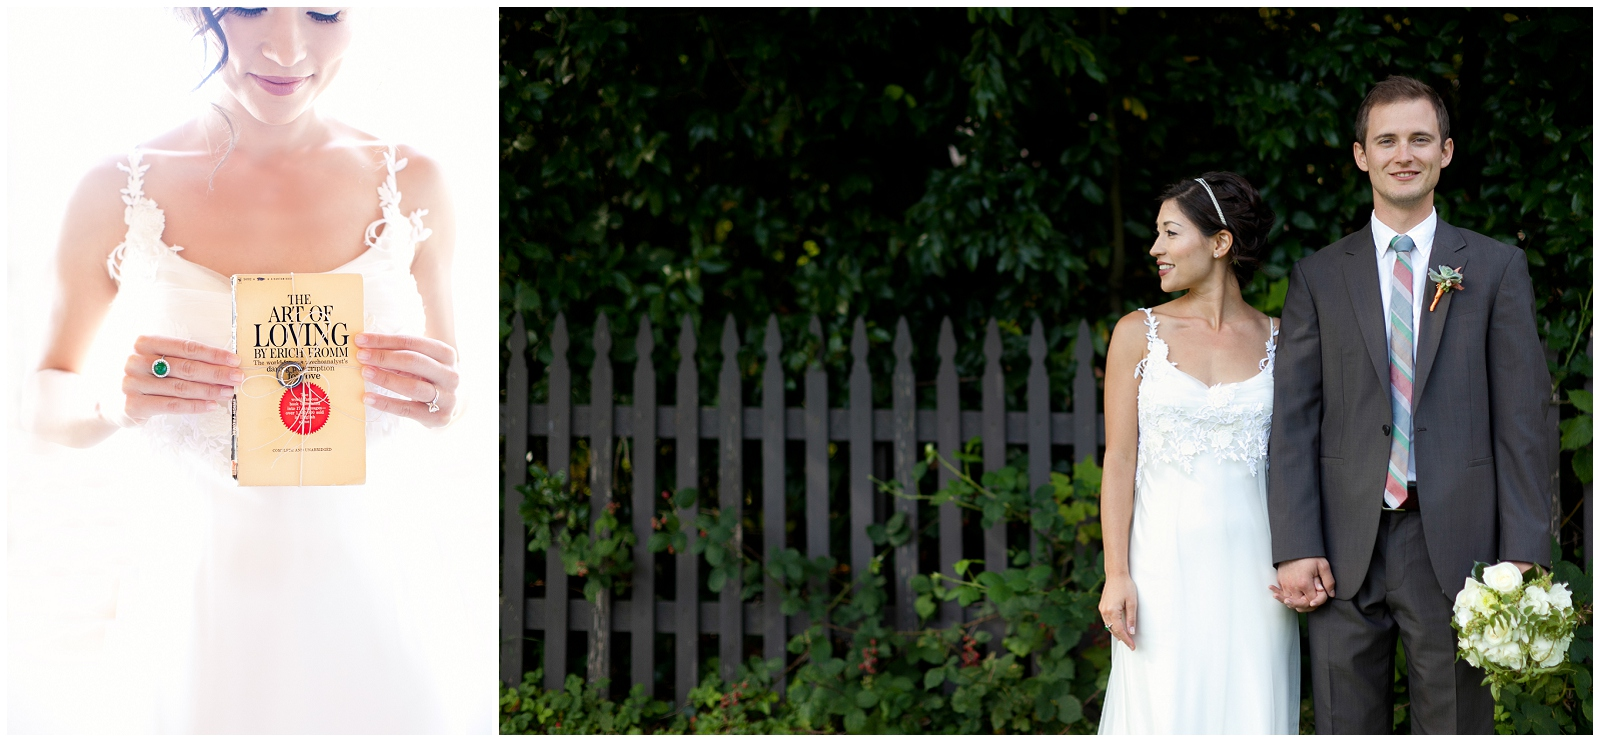 San-Francisco-Bay-Area-Wedding-Photography-Brazilian-Room-1.jpg